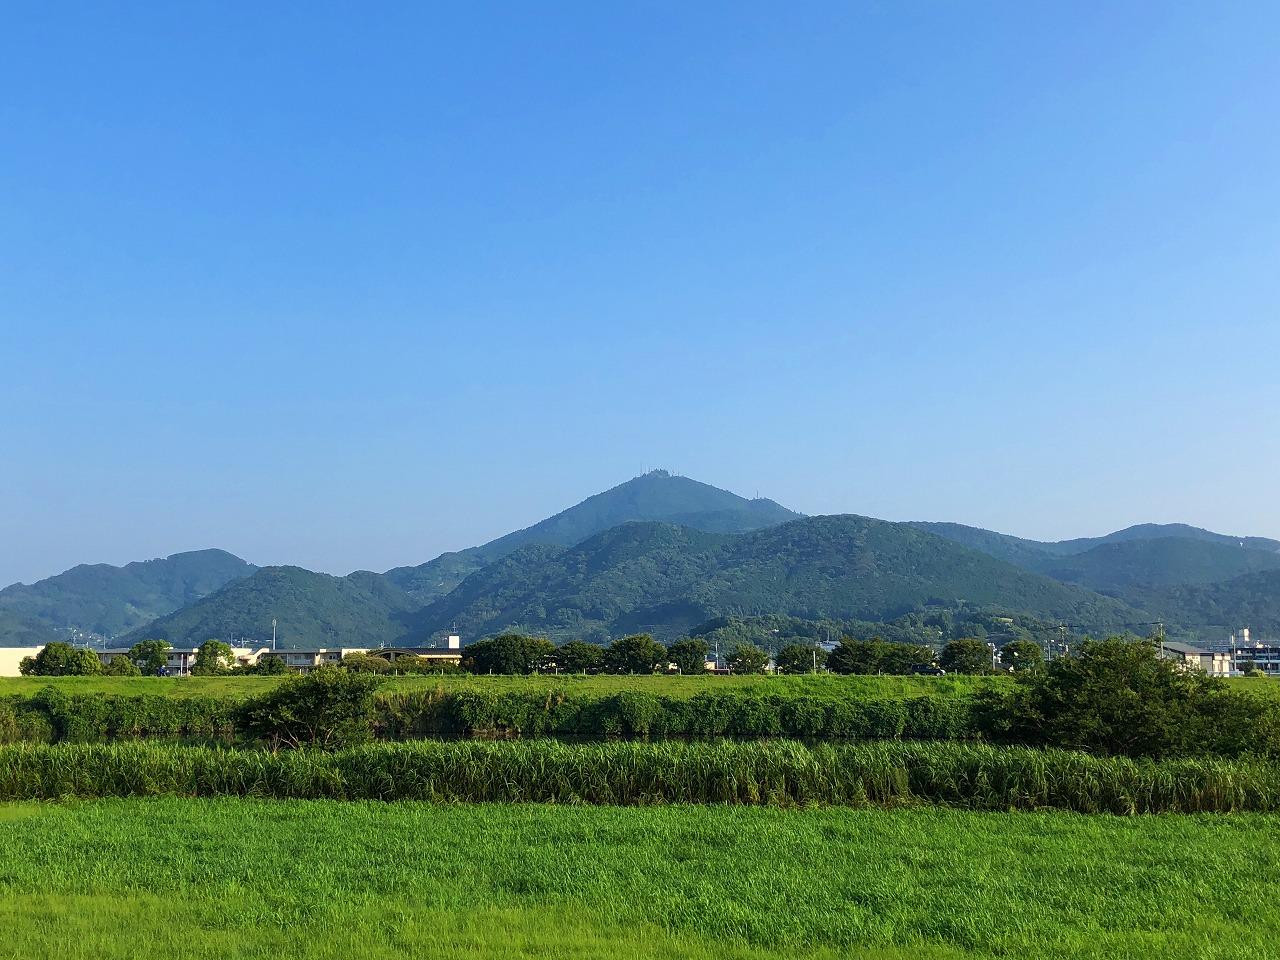 2018.8.3今朝の金峰山